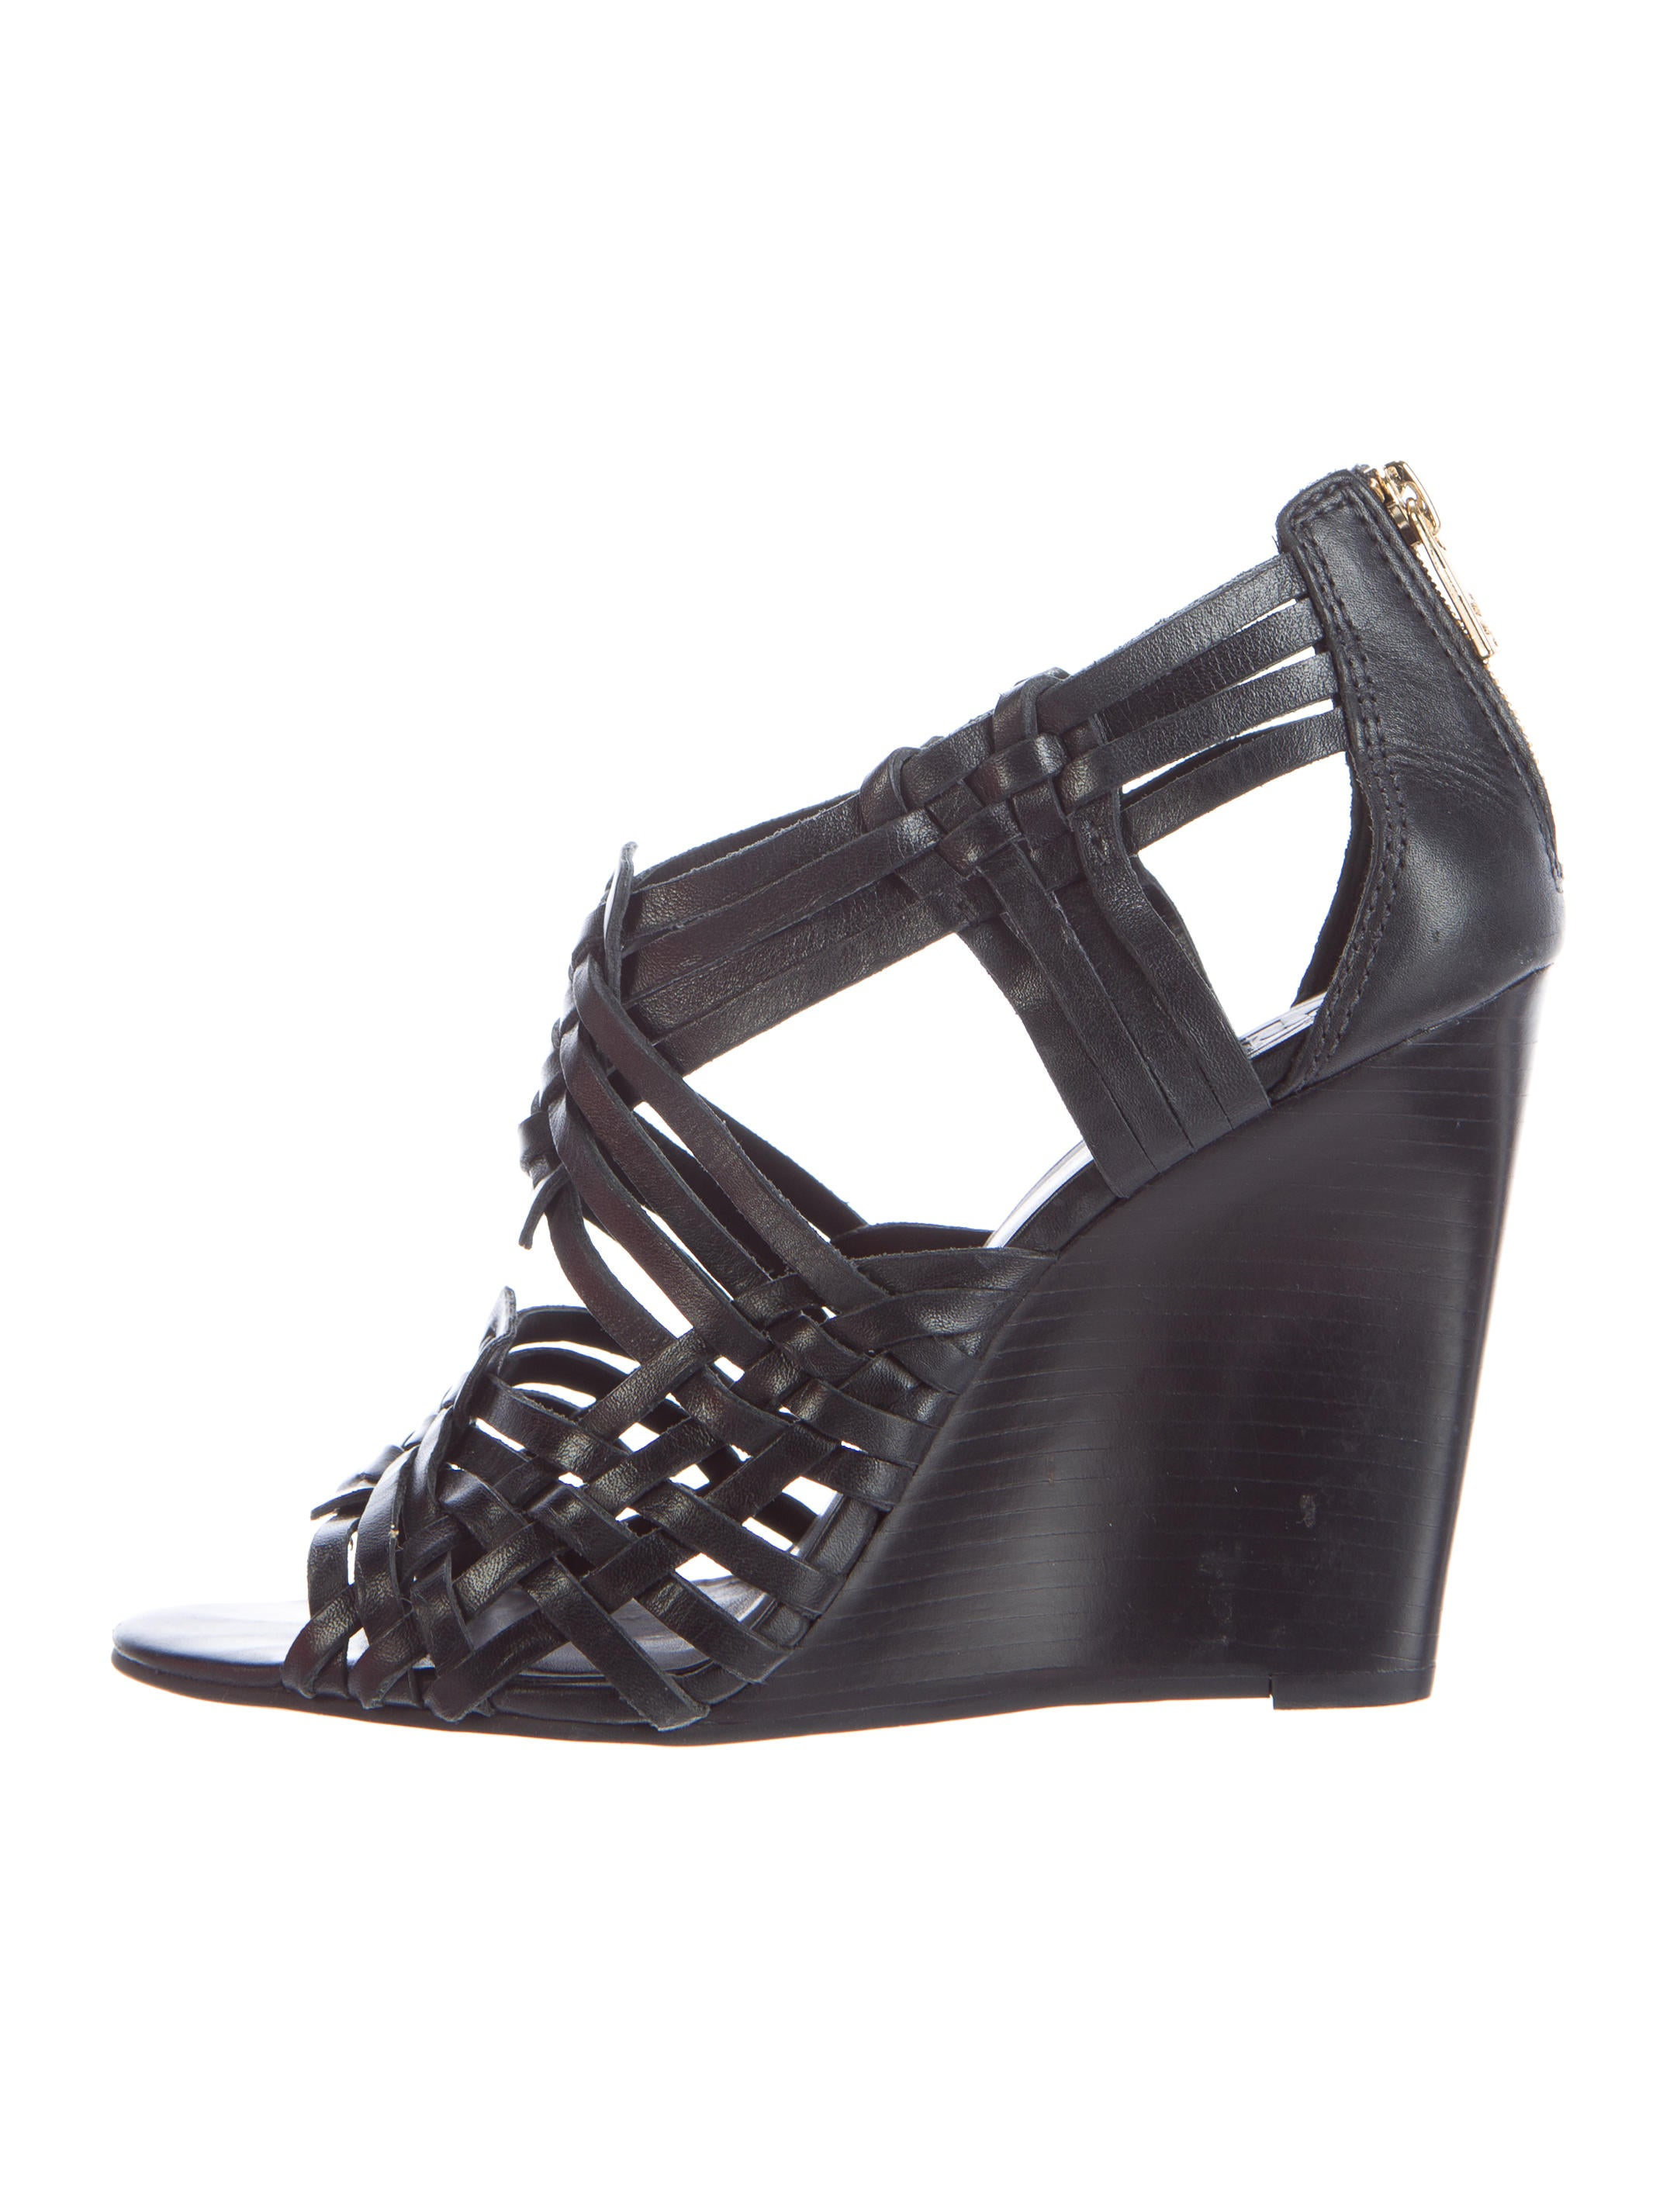 Tory Burch Tevray Huarache Wedge Sandal Shoes Wto74592